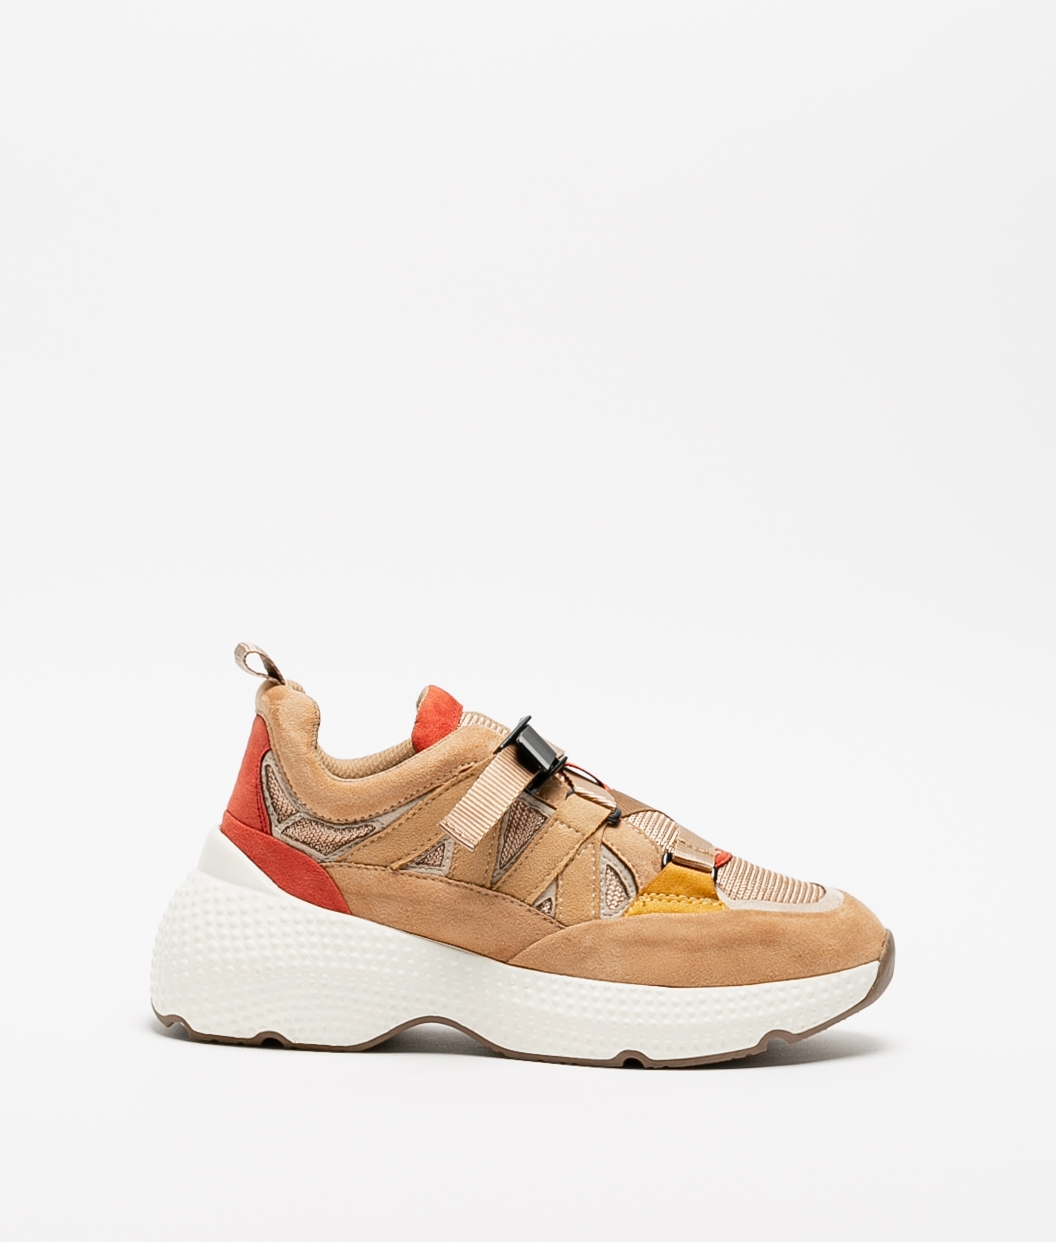 Sneakers Bundi - Camelo